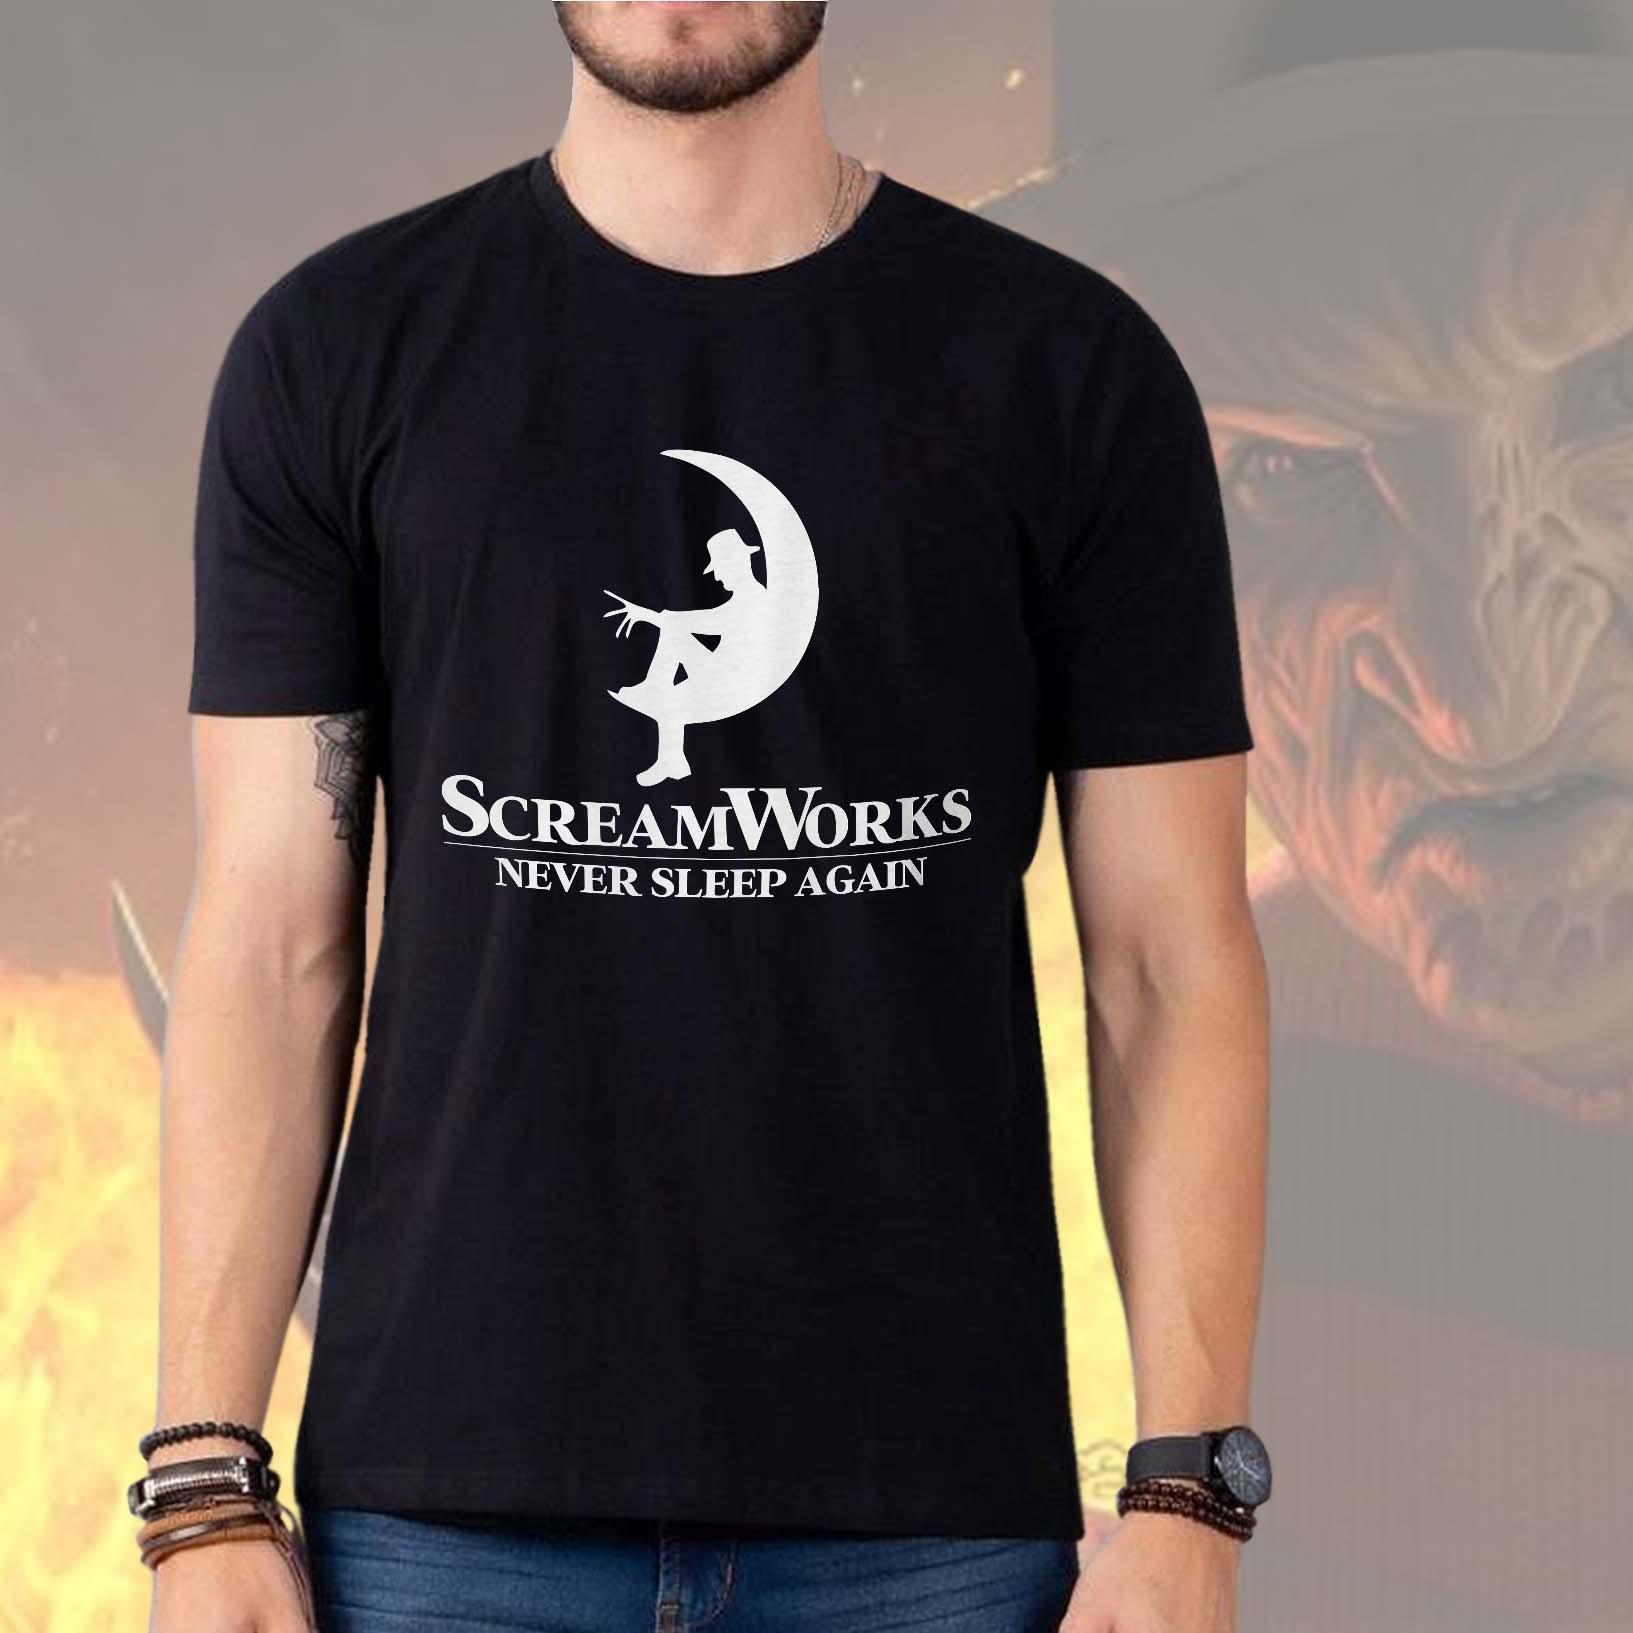 Camiseta Masculina Unissex Screamworks Never Sleep Again Freddy Krueger Terror Halloween (Preta) - EV